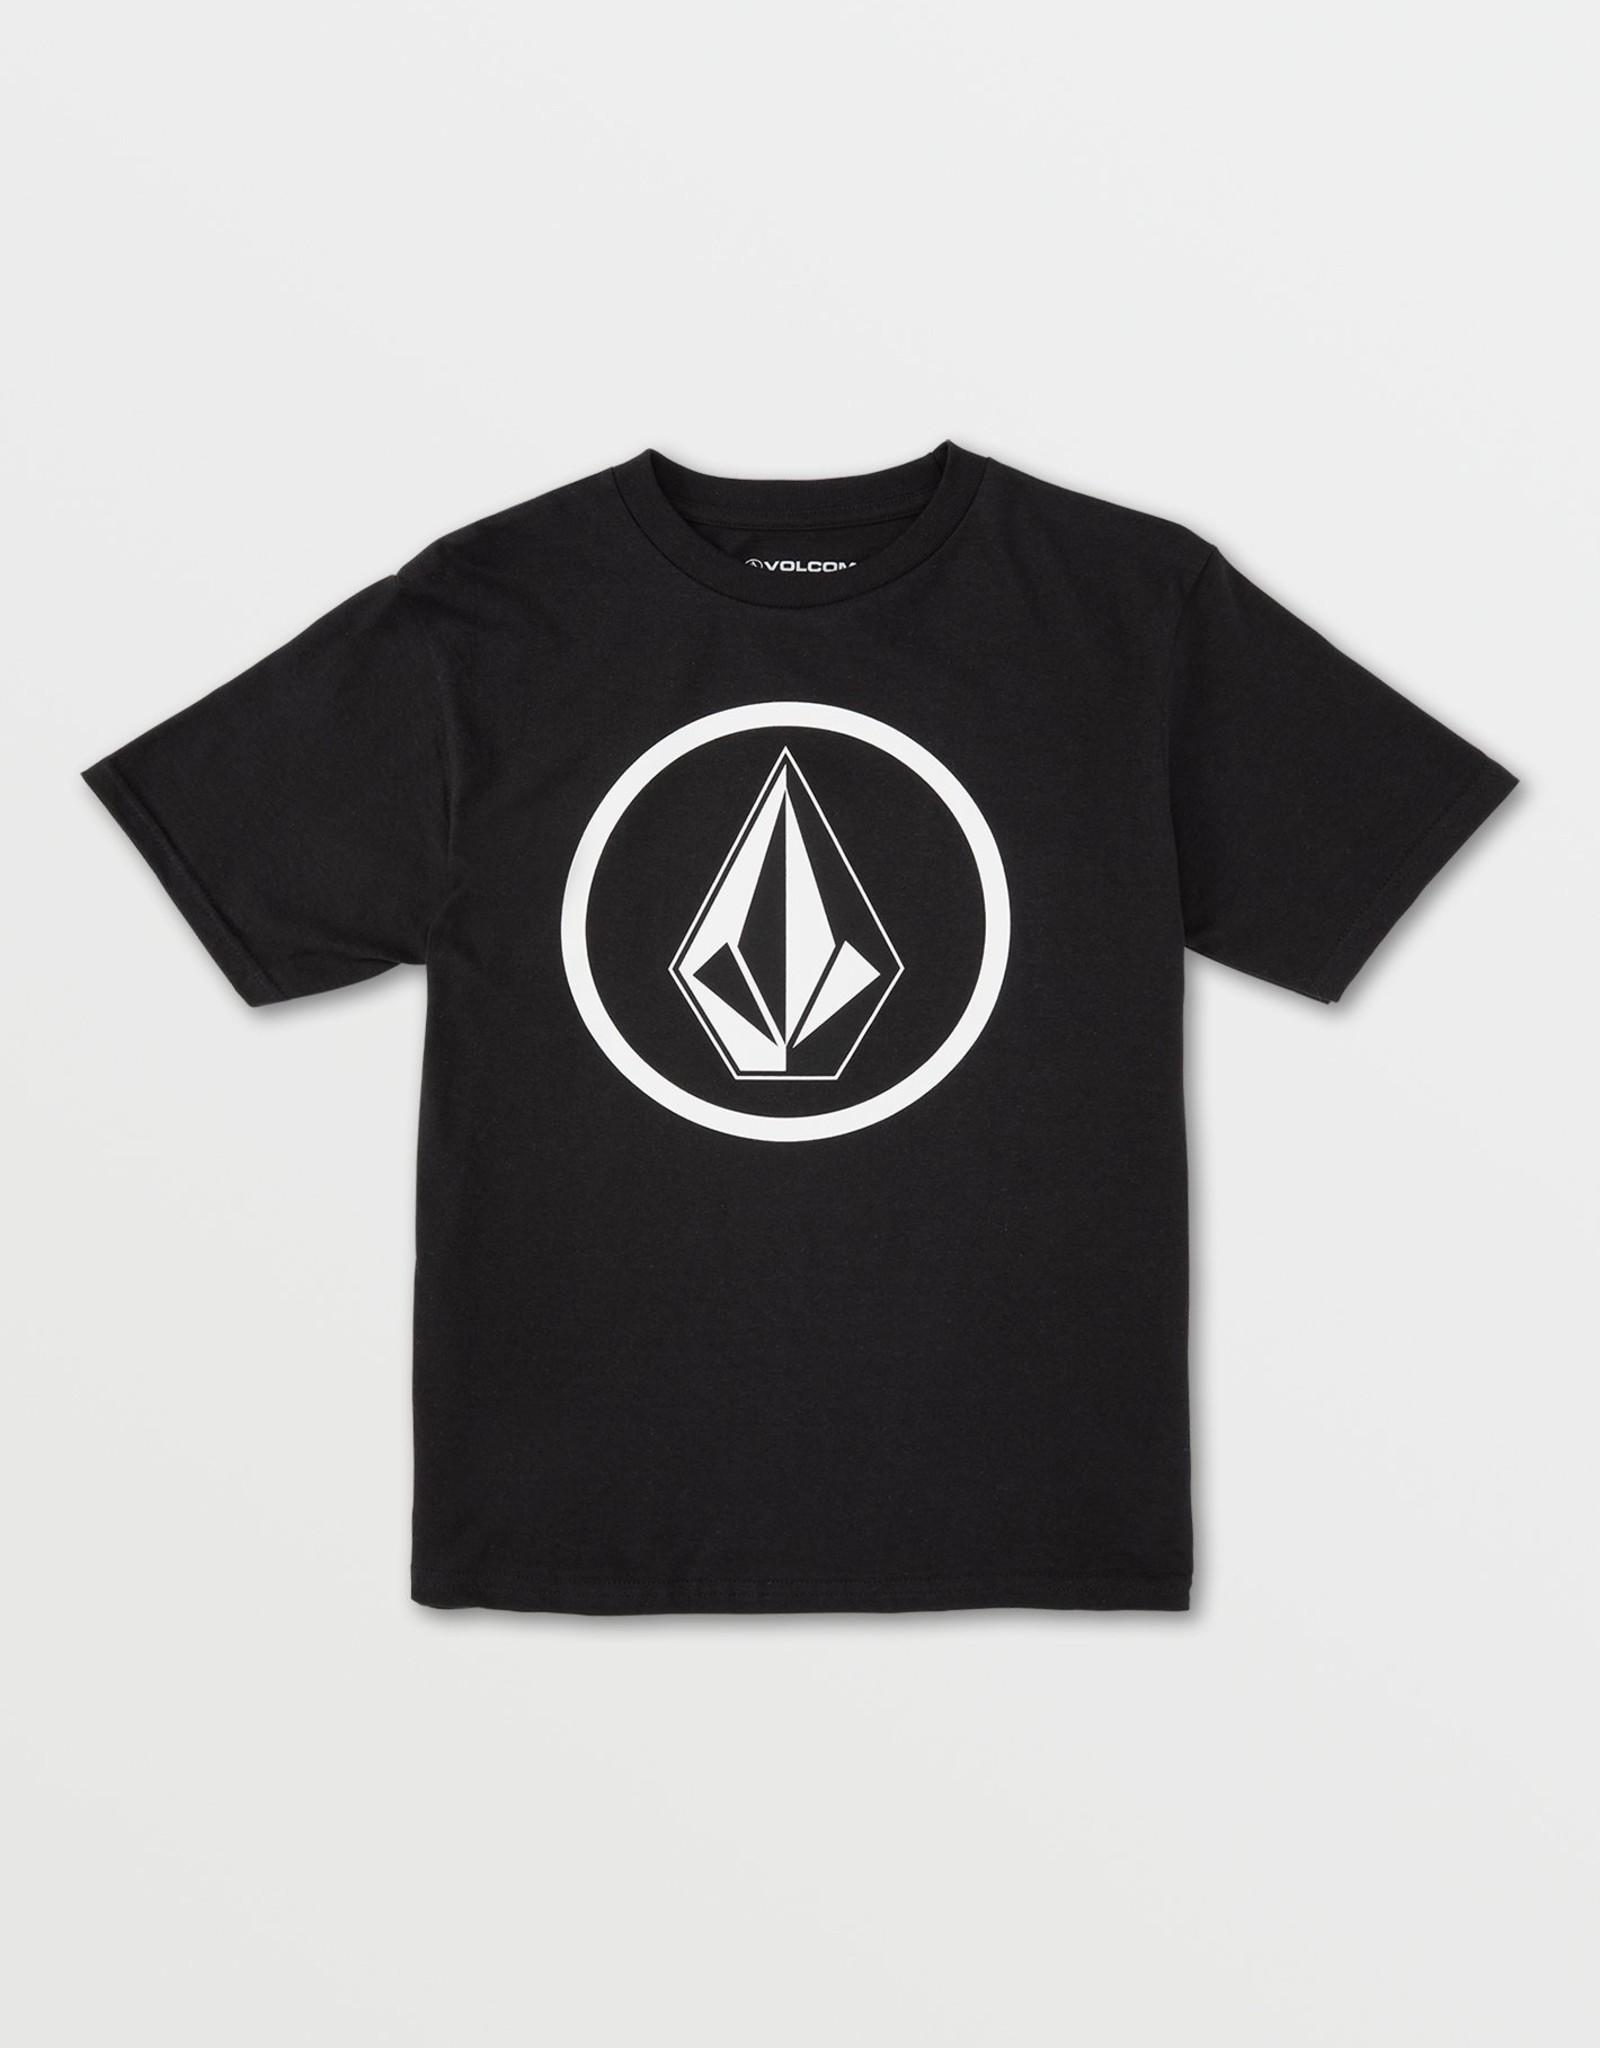 Volcom FA21 Circle Stone t-shirt